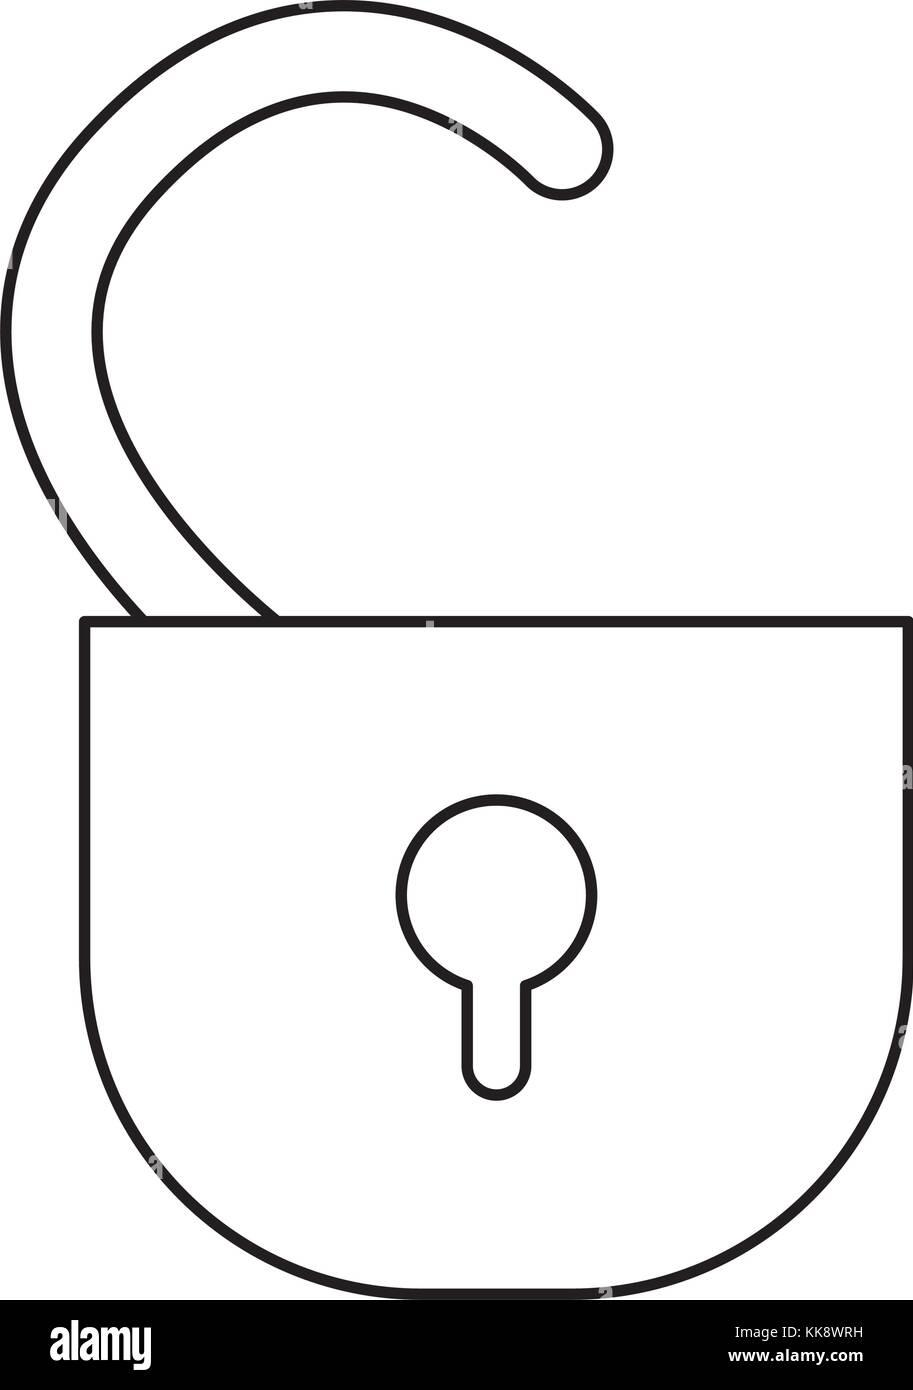 padlock  vector illustration - Stock Image